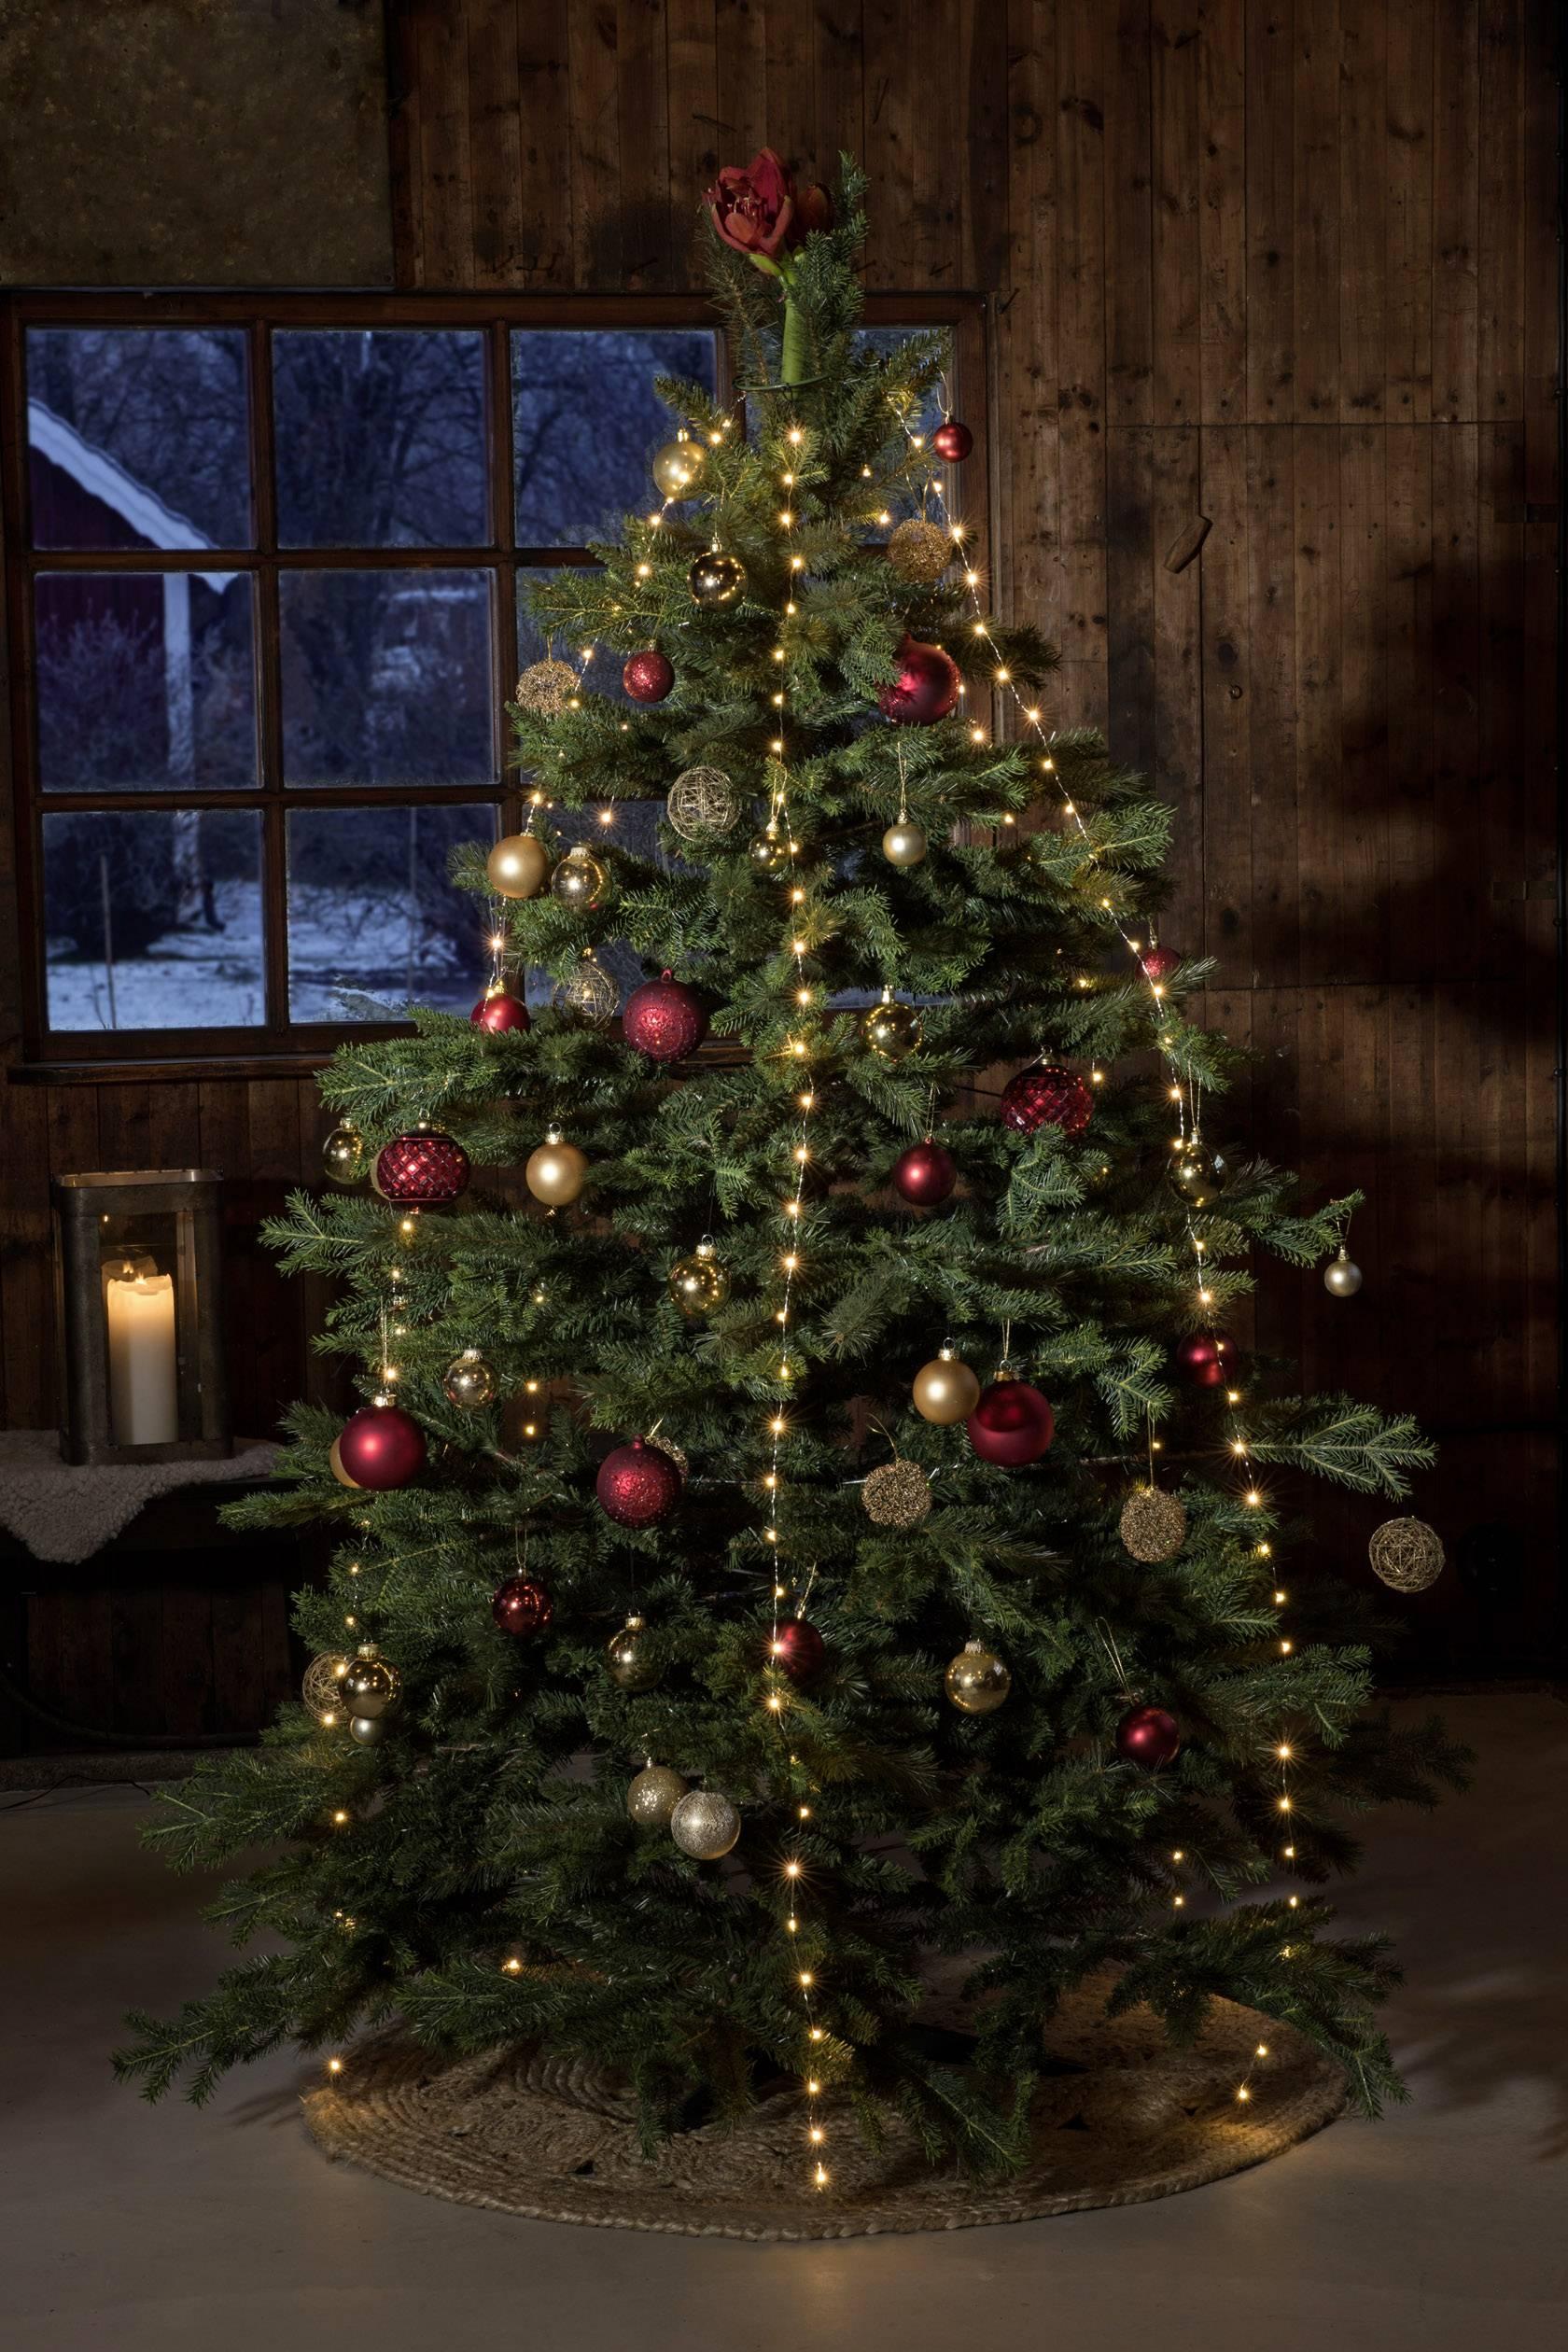 led boommantel druppel binnen werkt op het lichtnet 300 led amber verlichte lengte 3 m konstsmide 6379 890